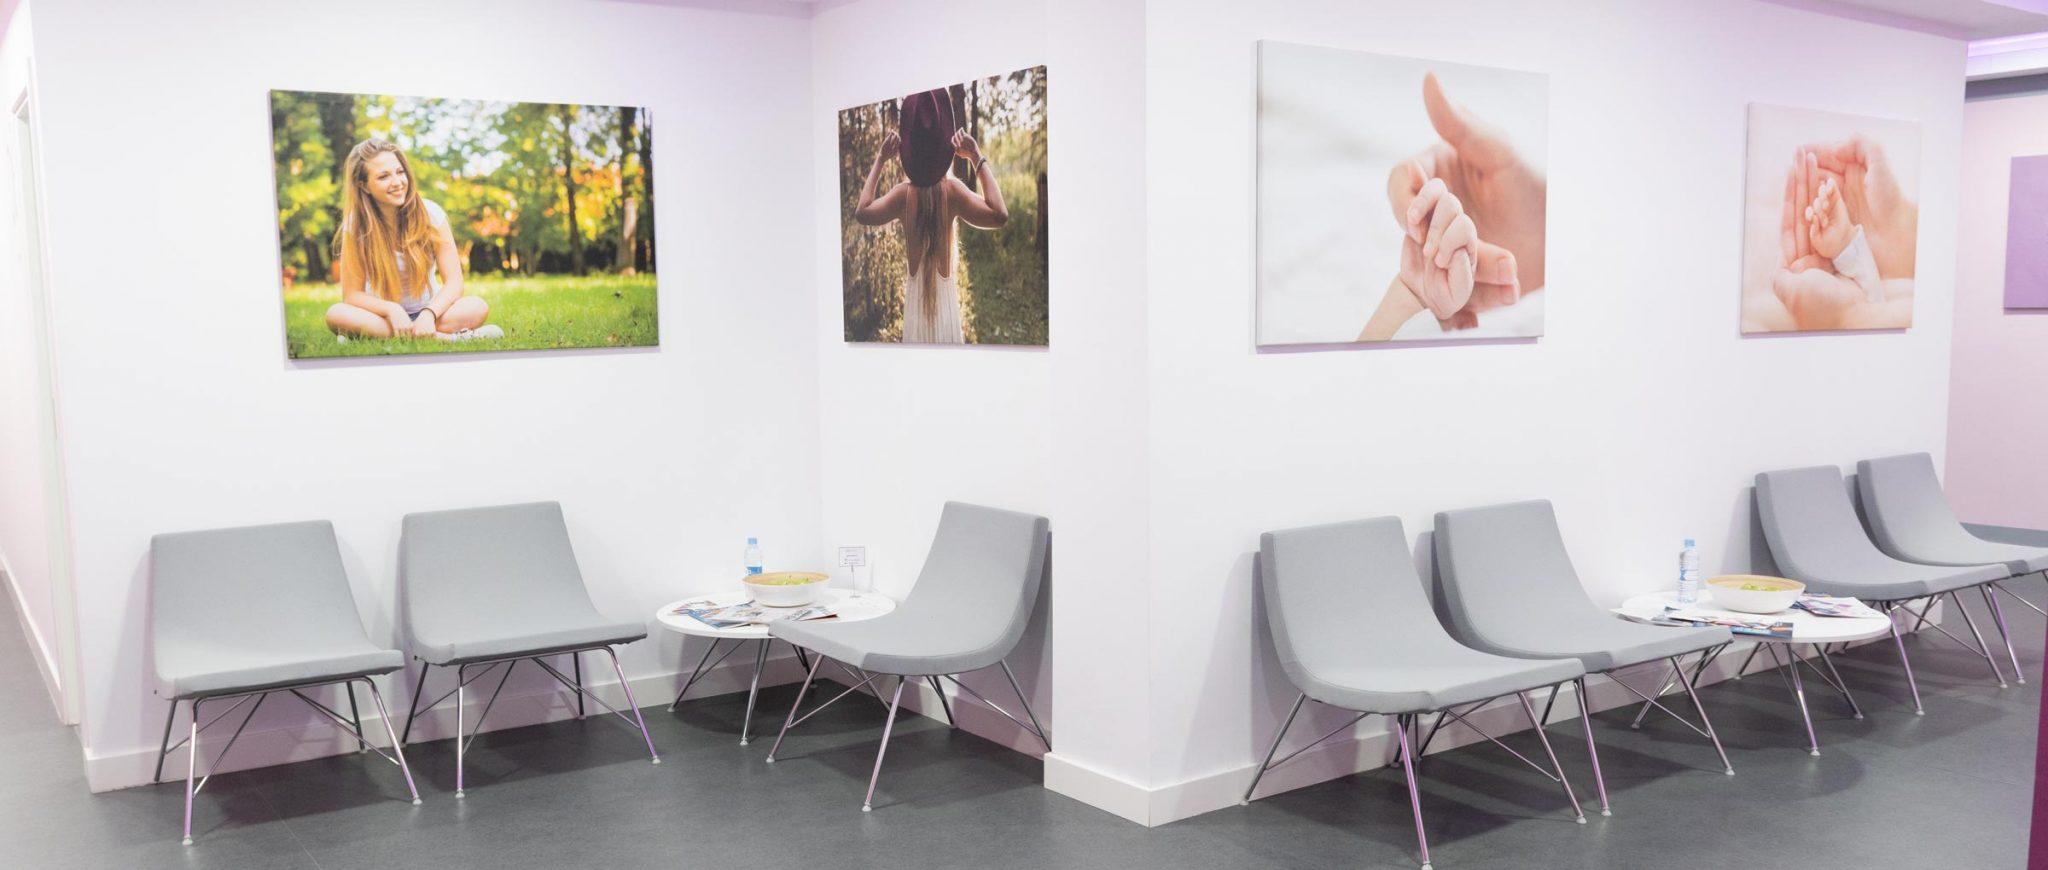 Zona de espera para las pacientes en reproclinic